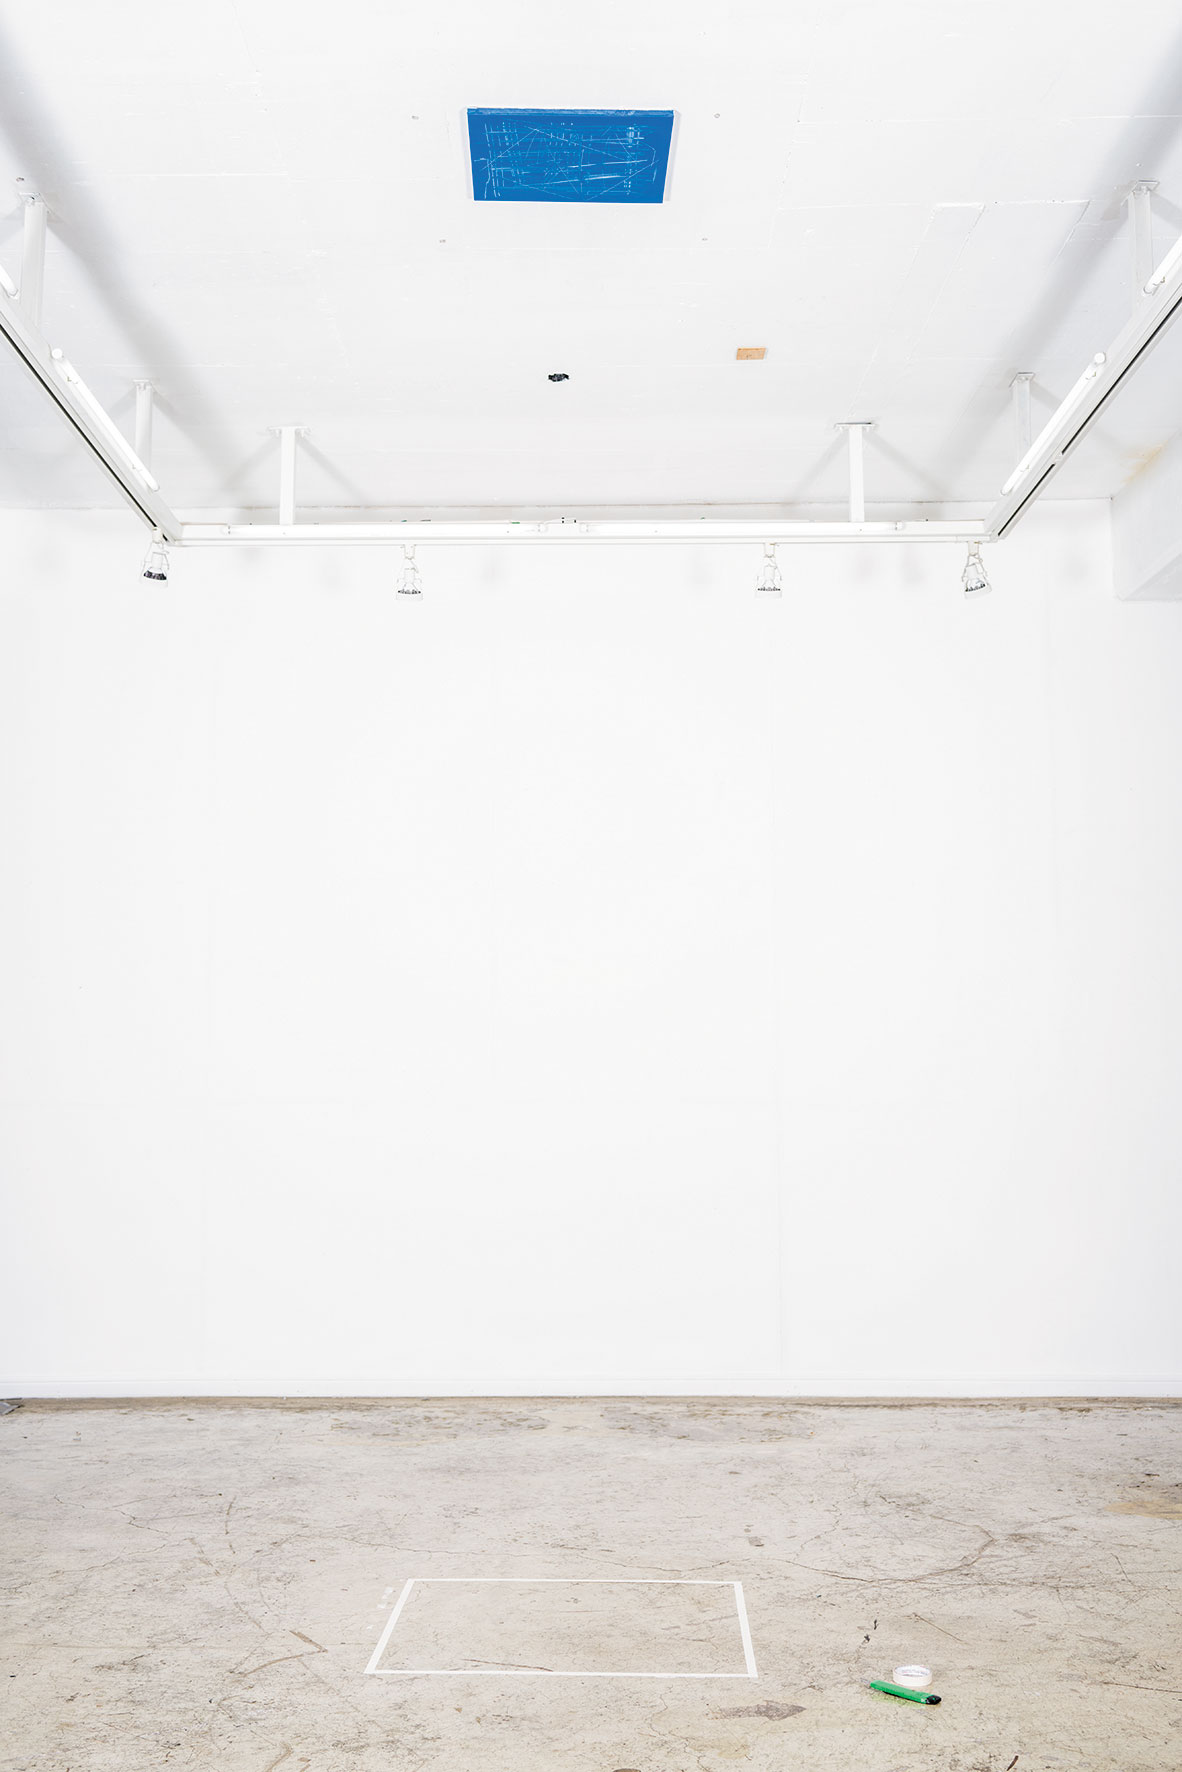 Art in Context (Kunst im Kontext), Universität der Künste Berlin (UdK Berlin), Rundgang 2019